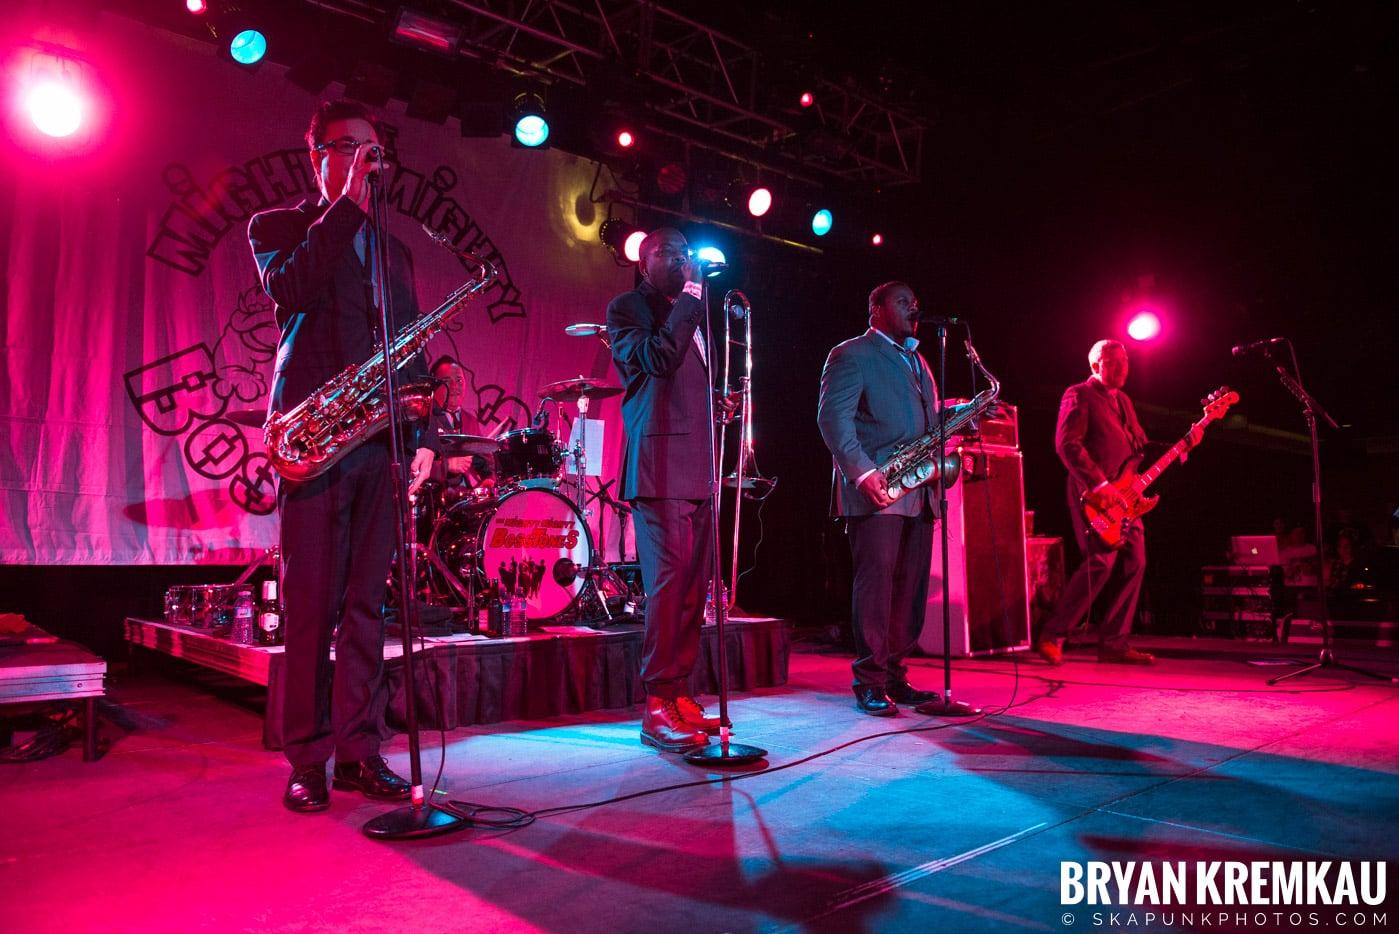 Mighty Mighty Bosstones @ Starland Ballroom, Sayreville, NJ - 7.29.17 (6)